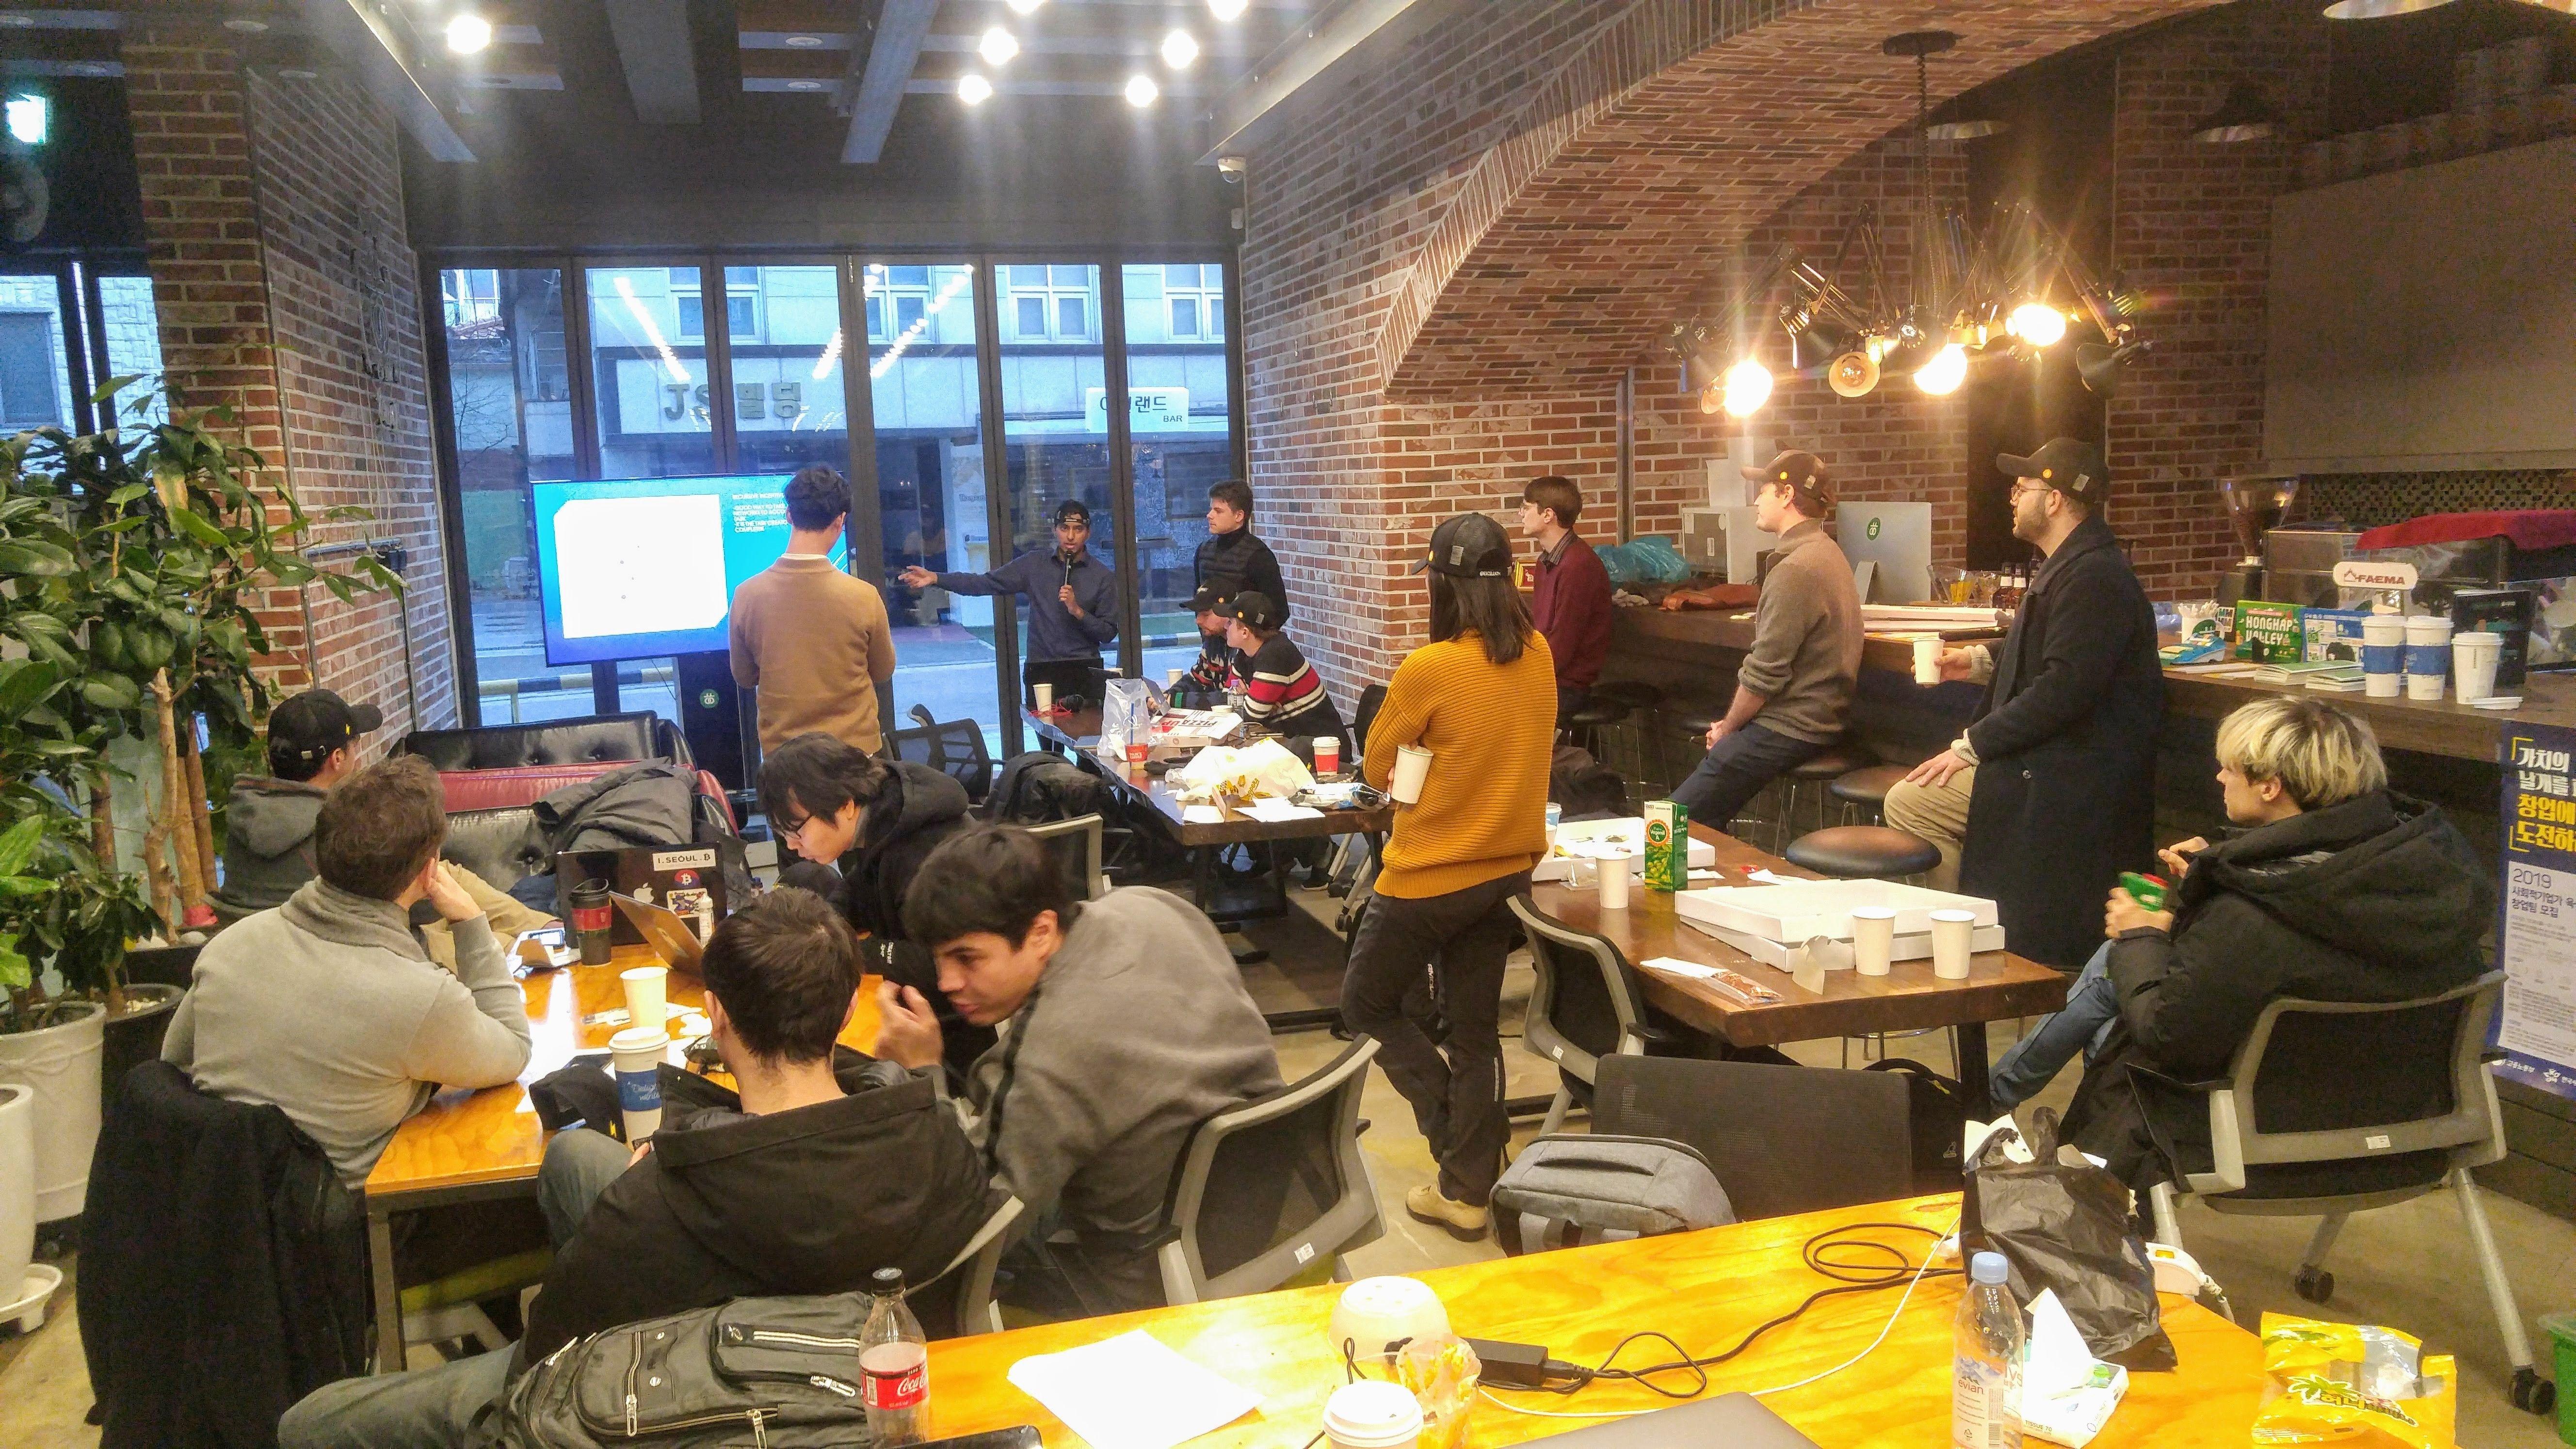 Hackathon in Progress